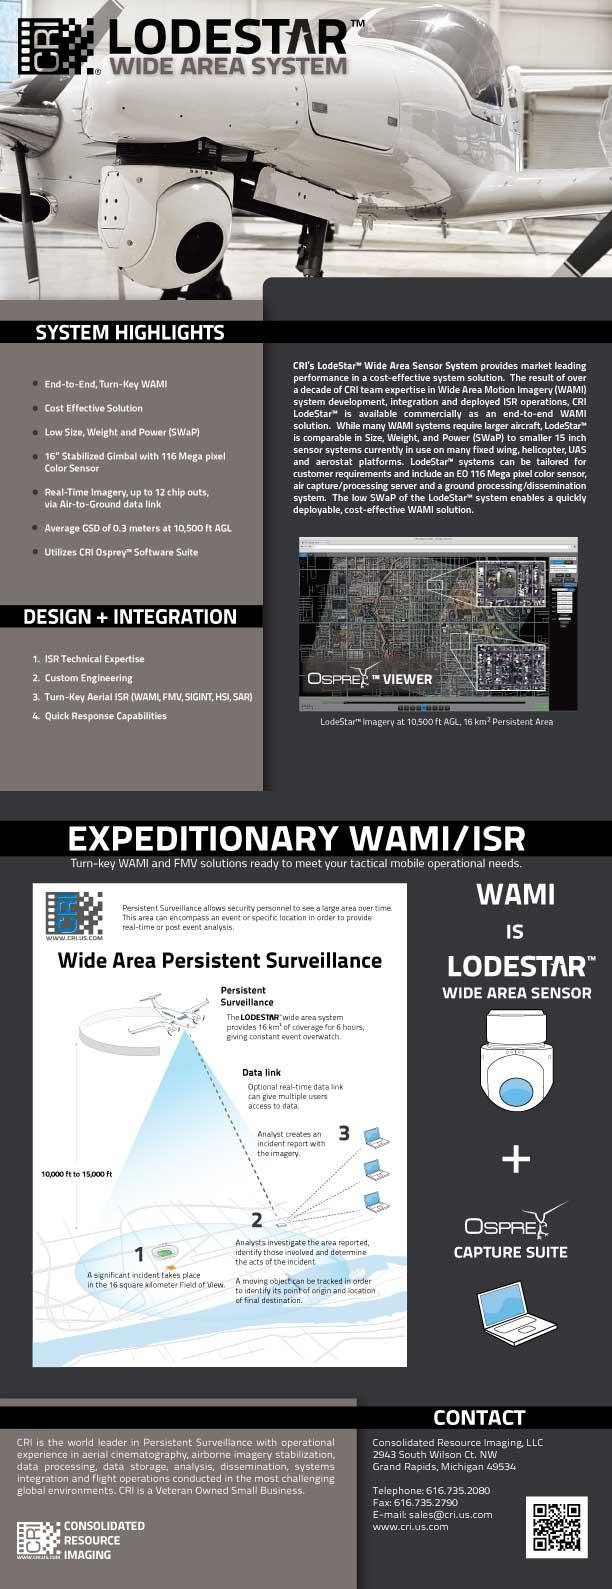 PDF of LodeStar Doc